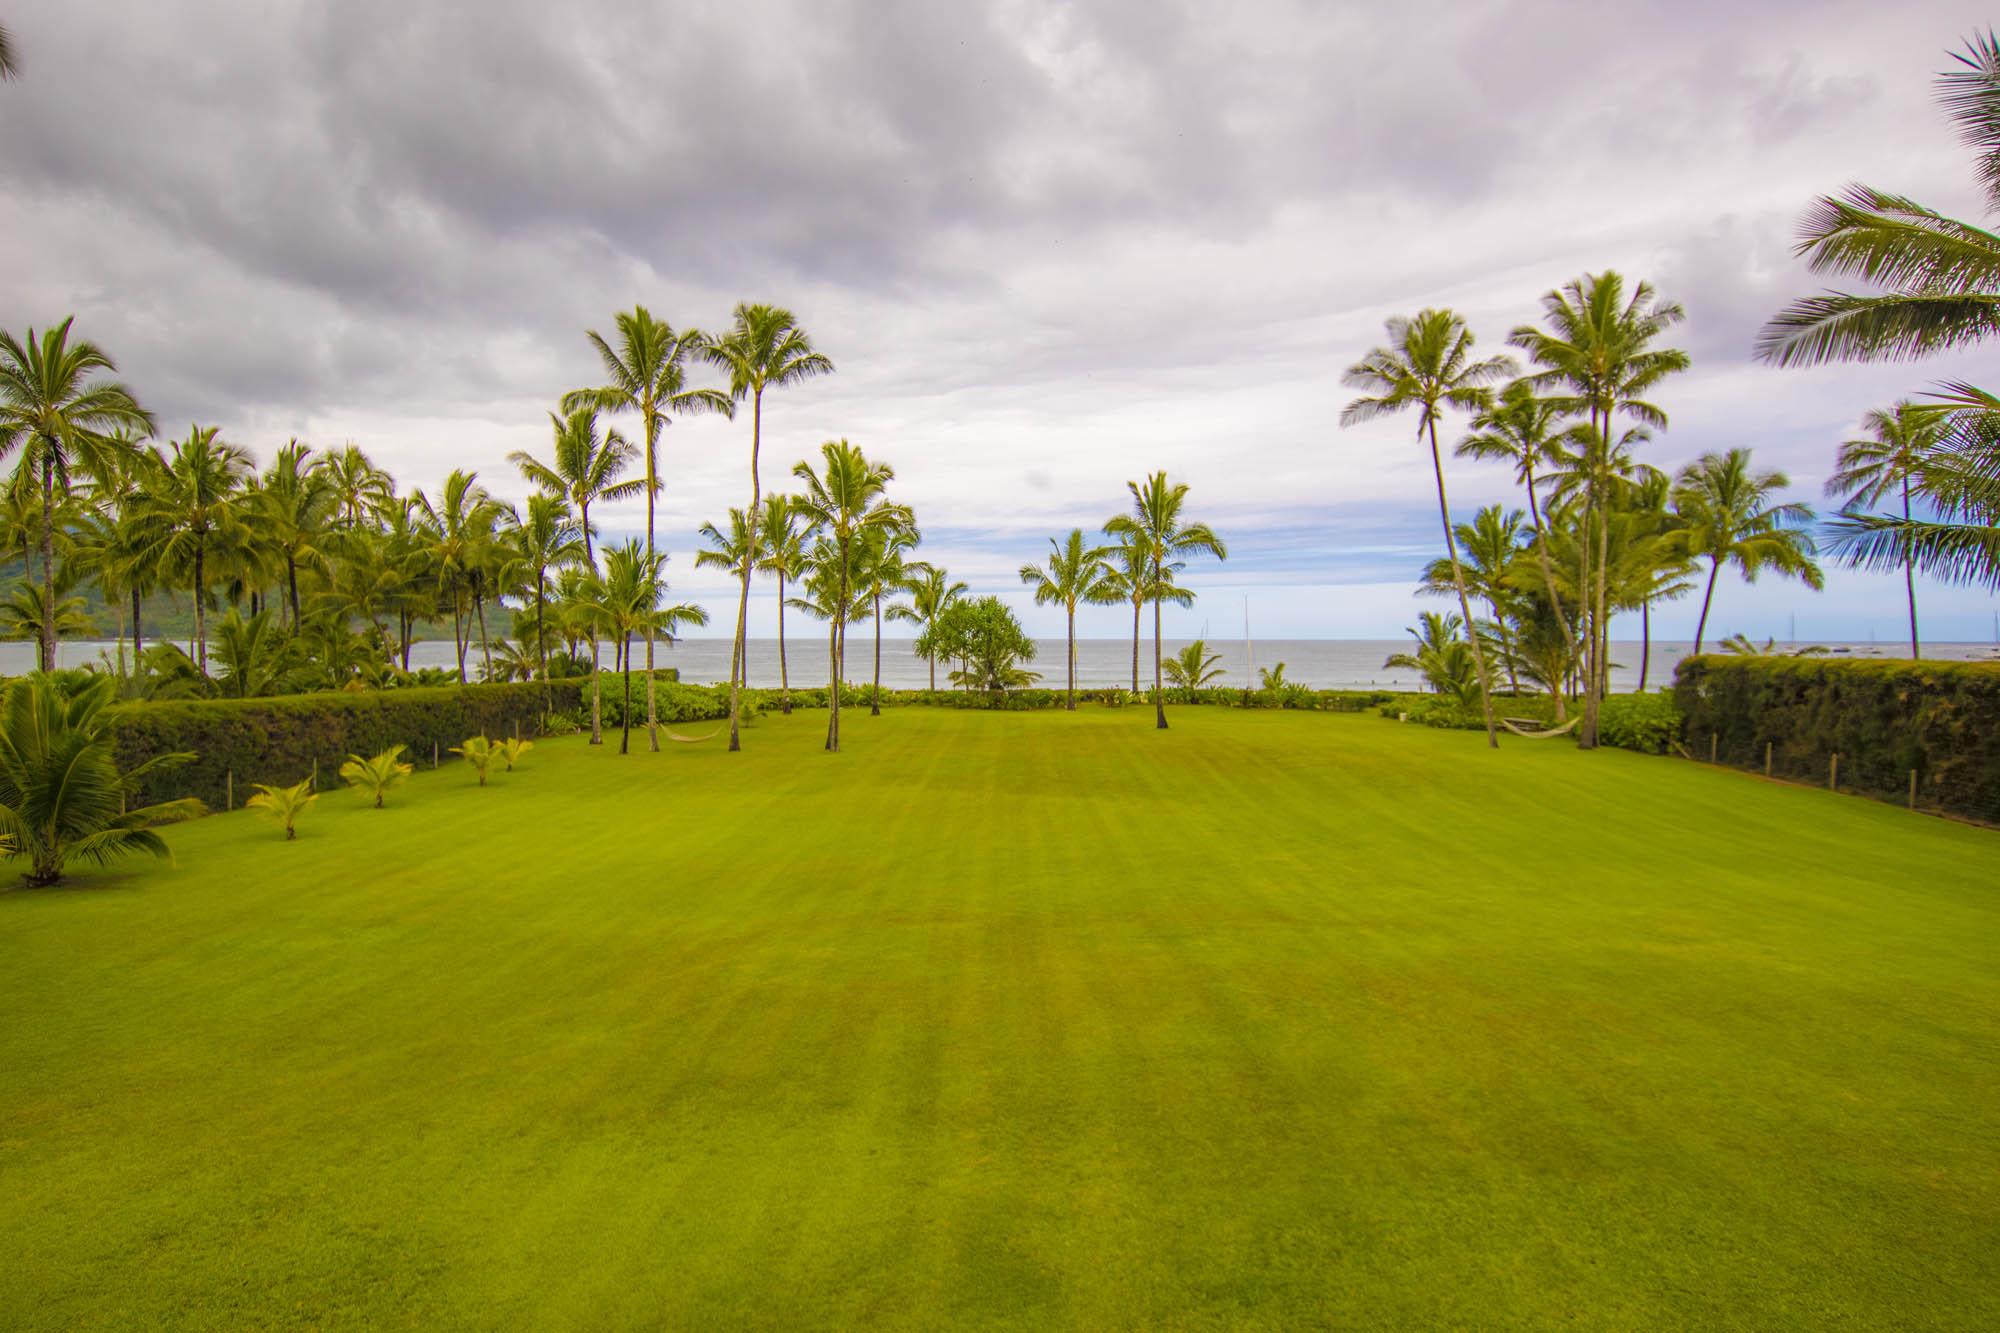 Kauai-217-Hanalei Bay2